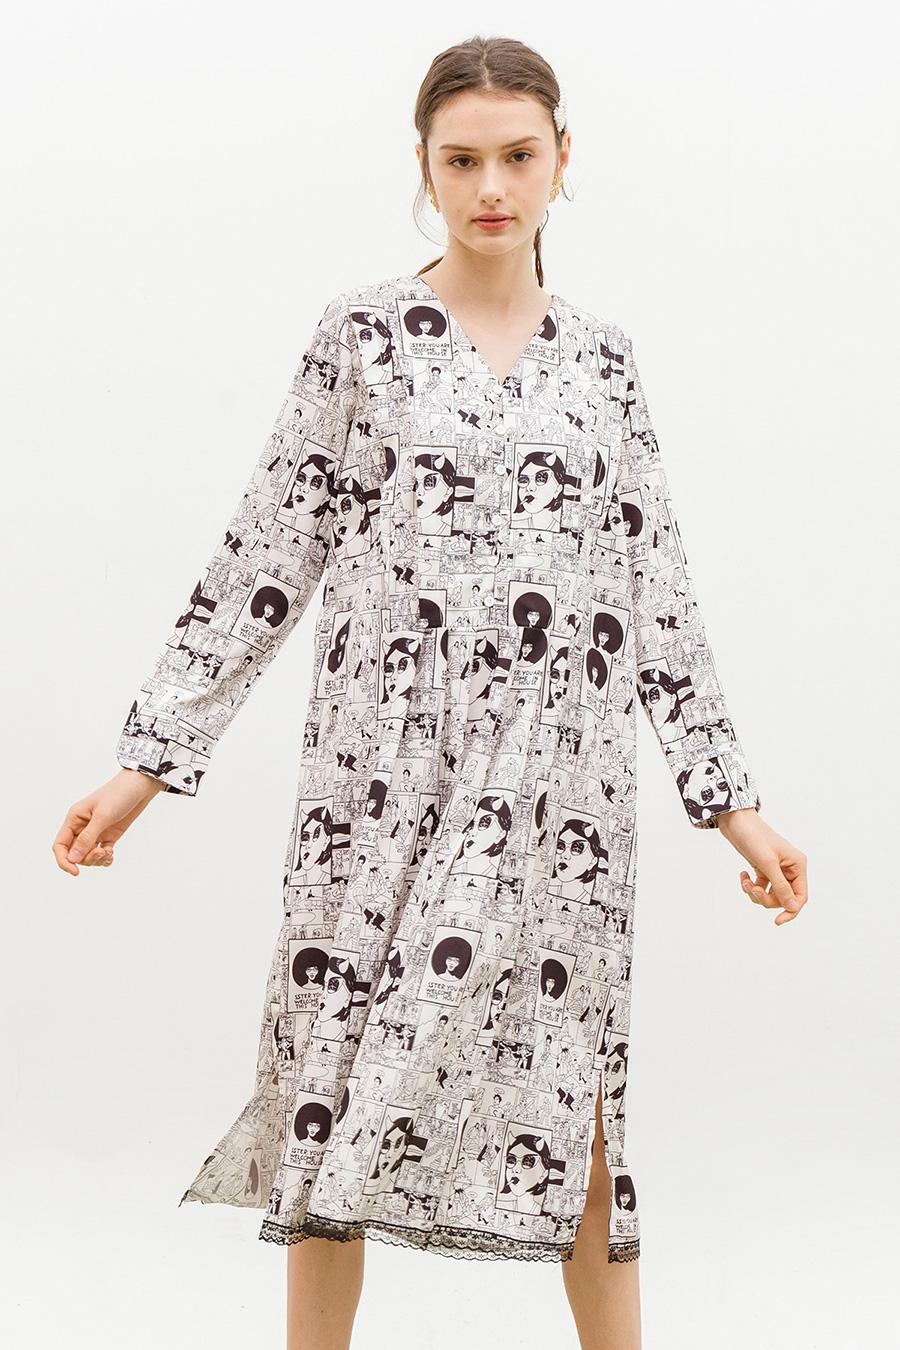 *SALE* FONTAINE DRESS - COMIC STRIP